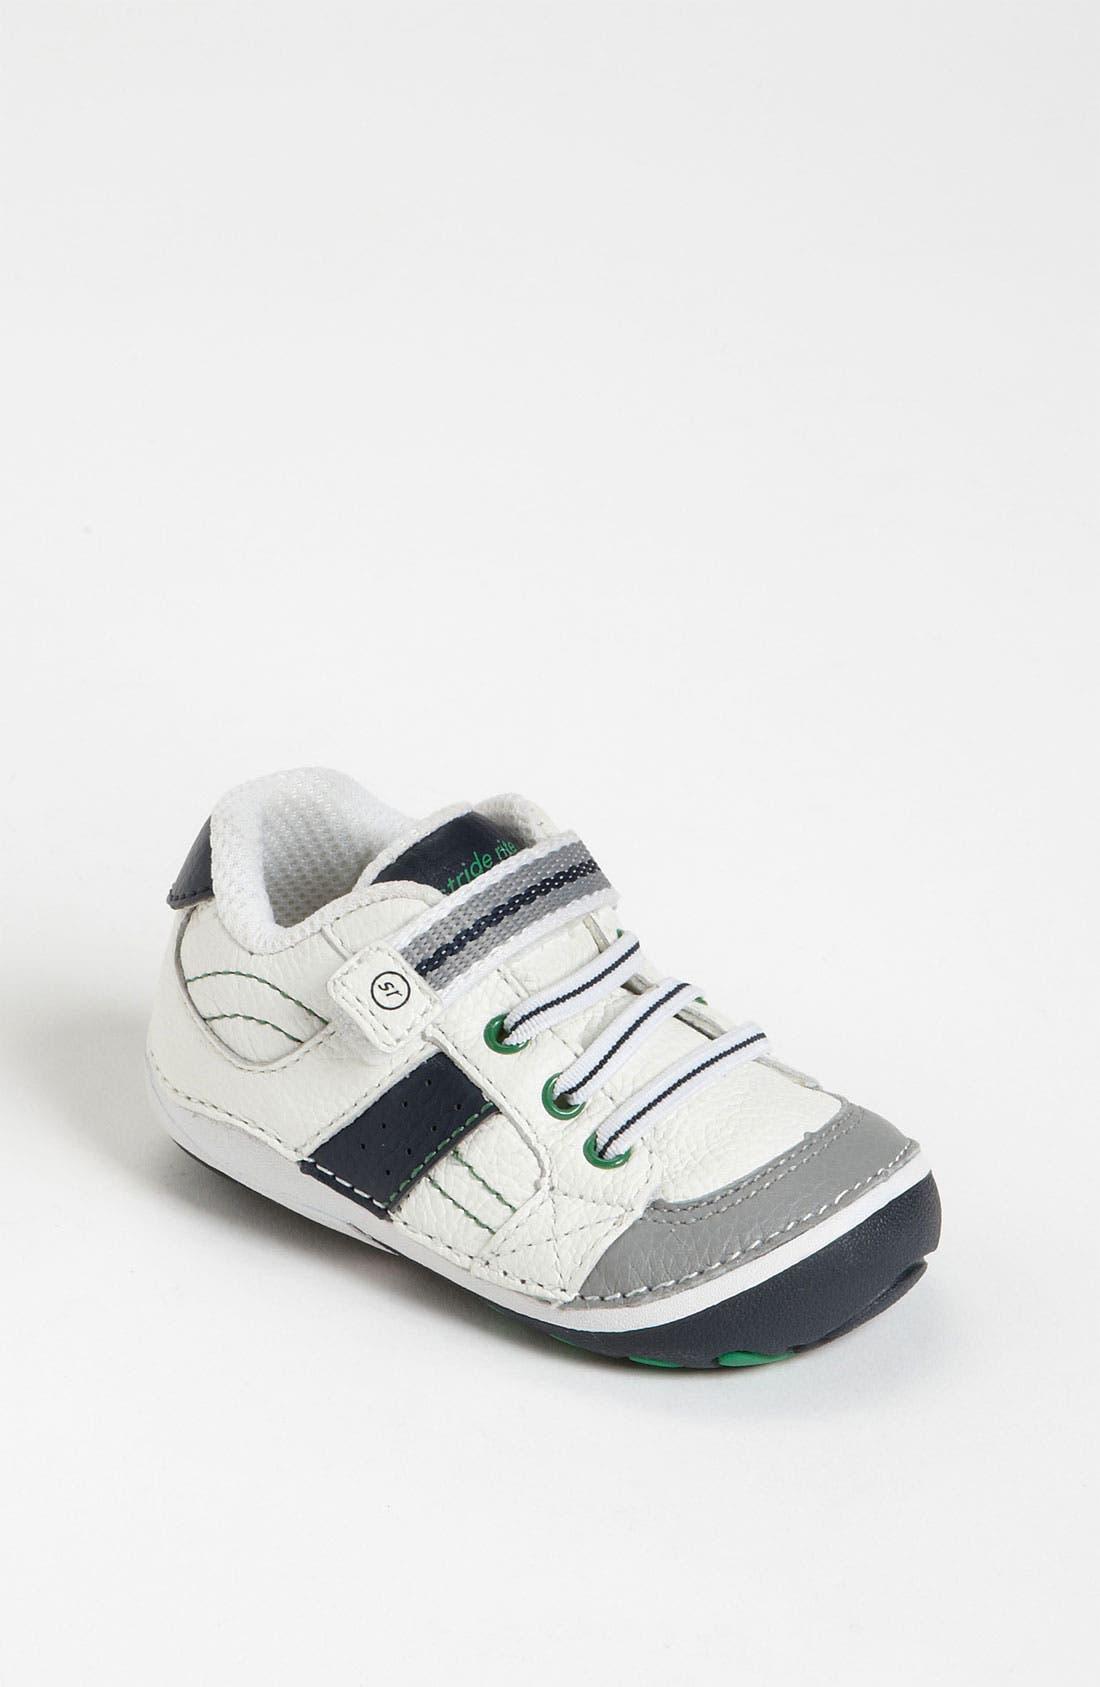 STRIDE RITE 'Arte' Sneaker, Main, color, WHITE/ NAVY